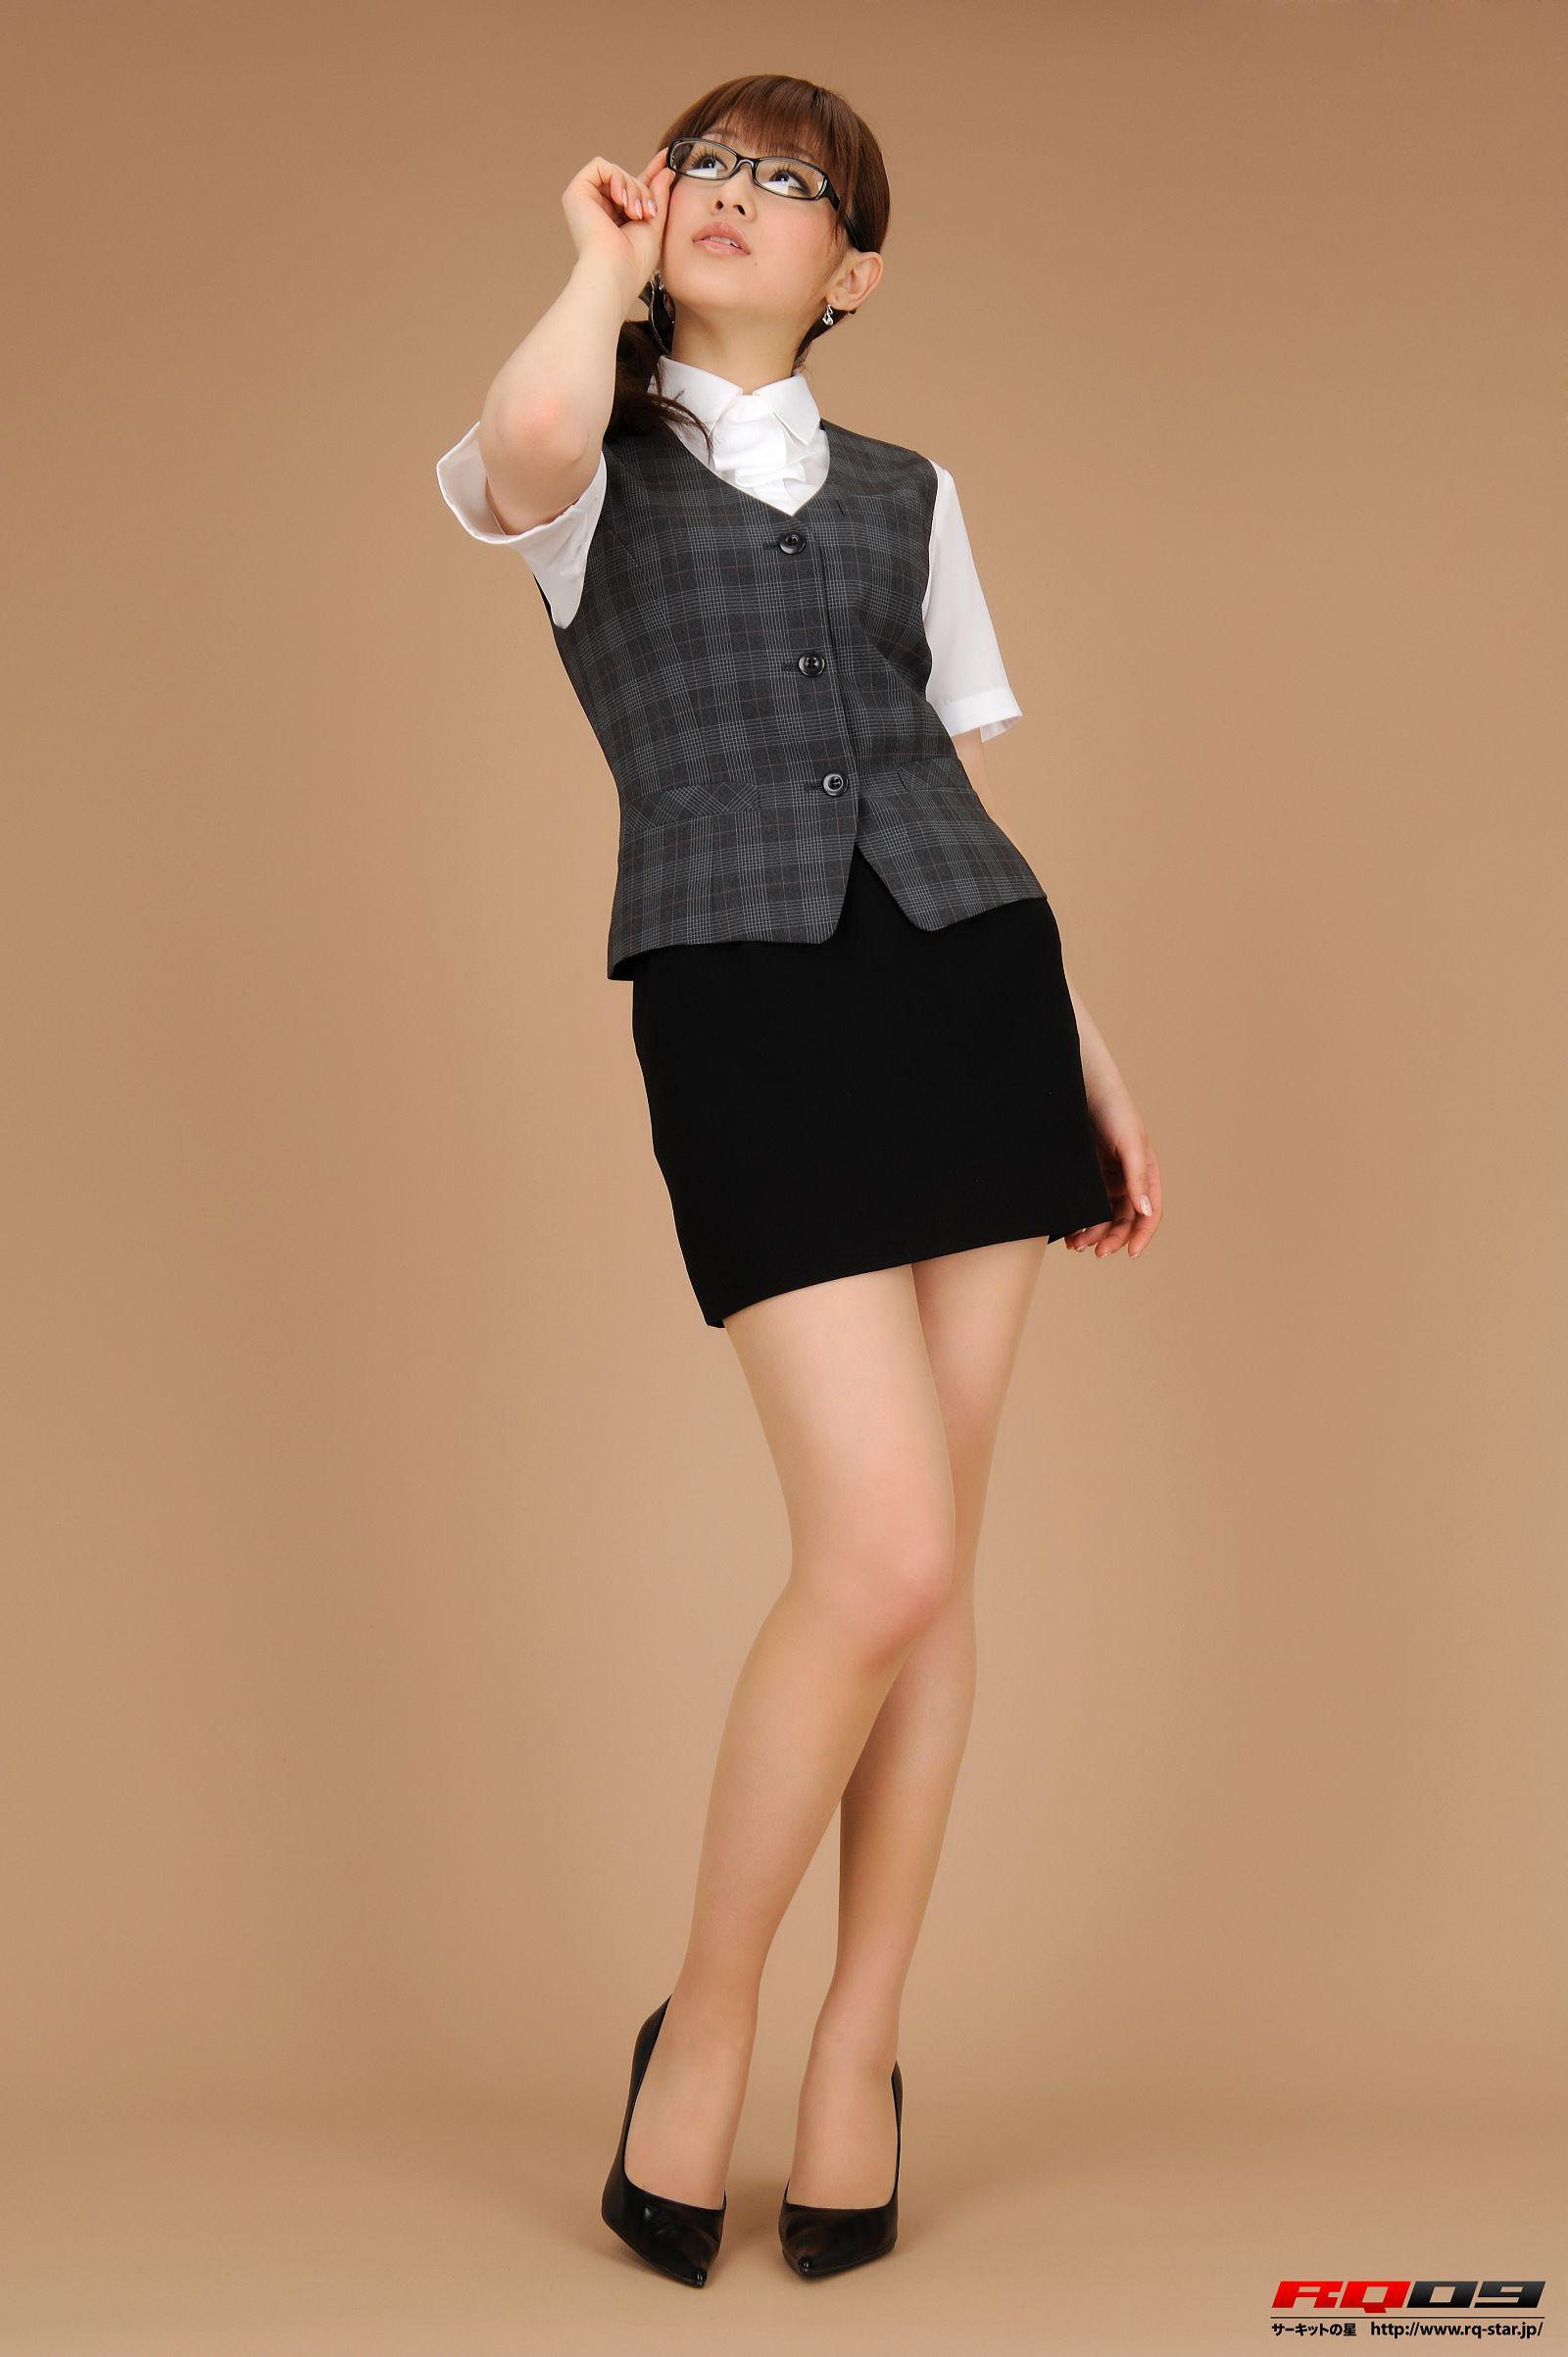 [RQ STAR美女] NO.0179 Chika Tohno 遠野千夏 Office Lady[120P] RQ STAR 第2张